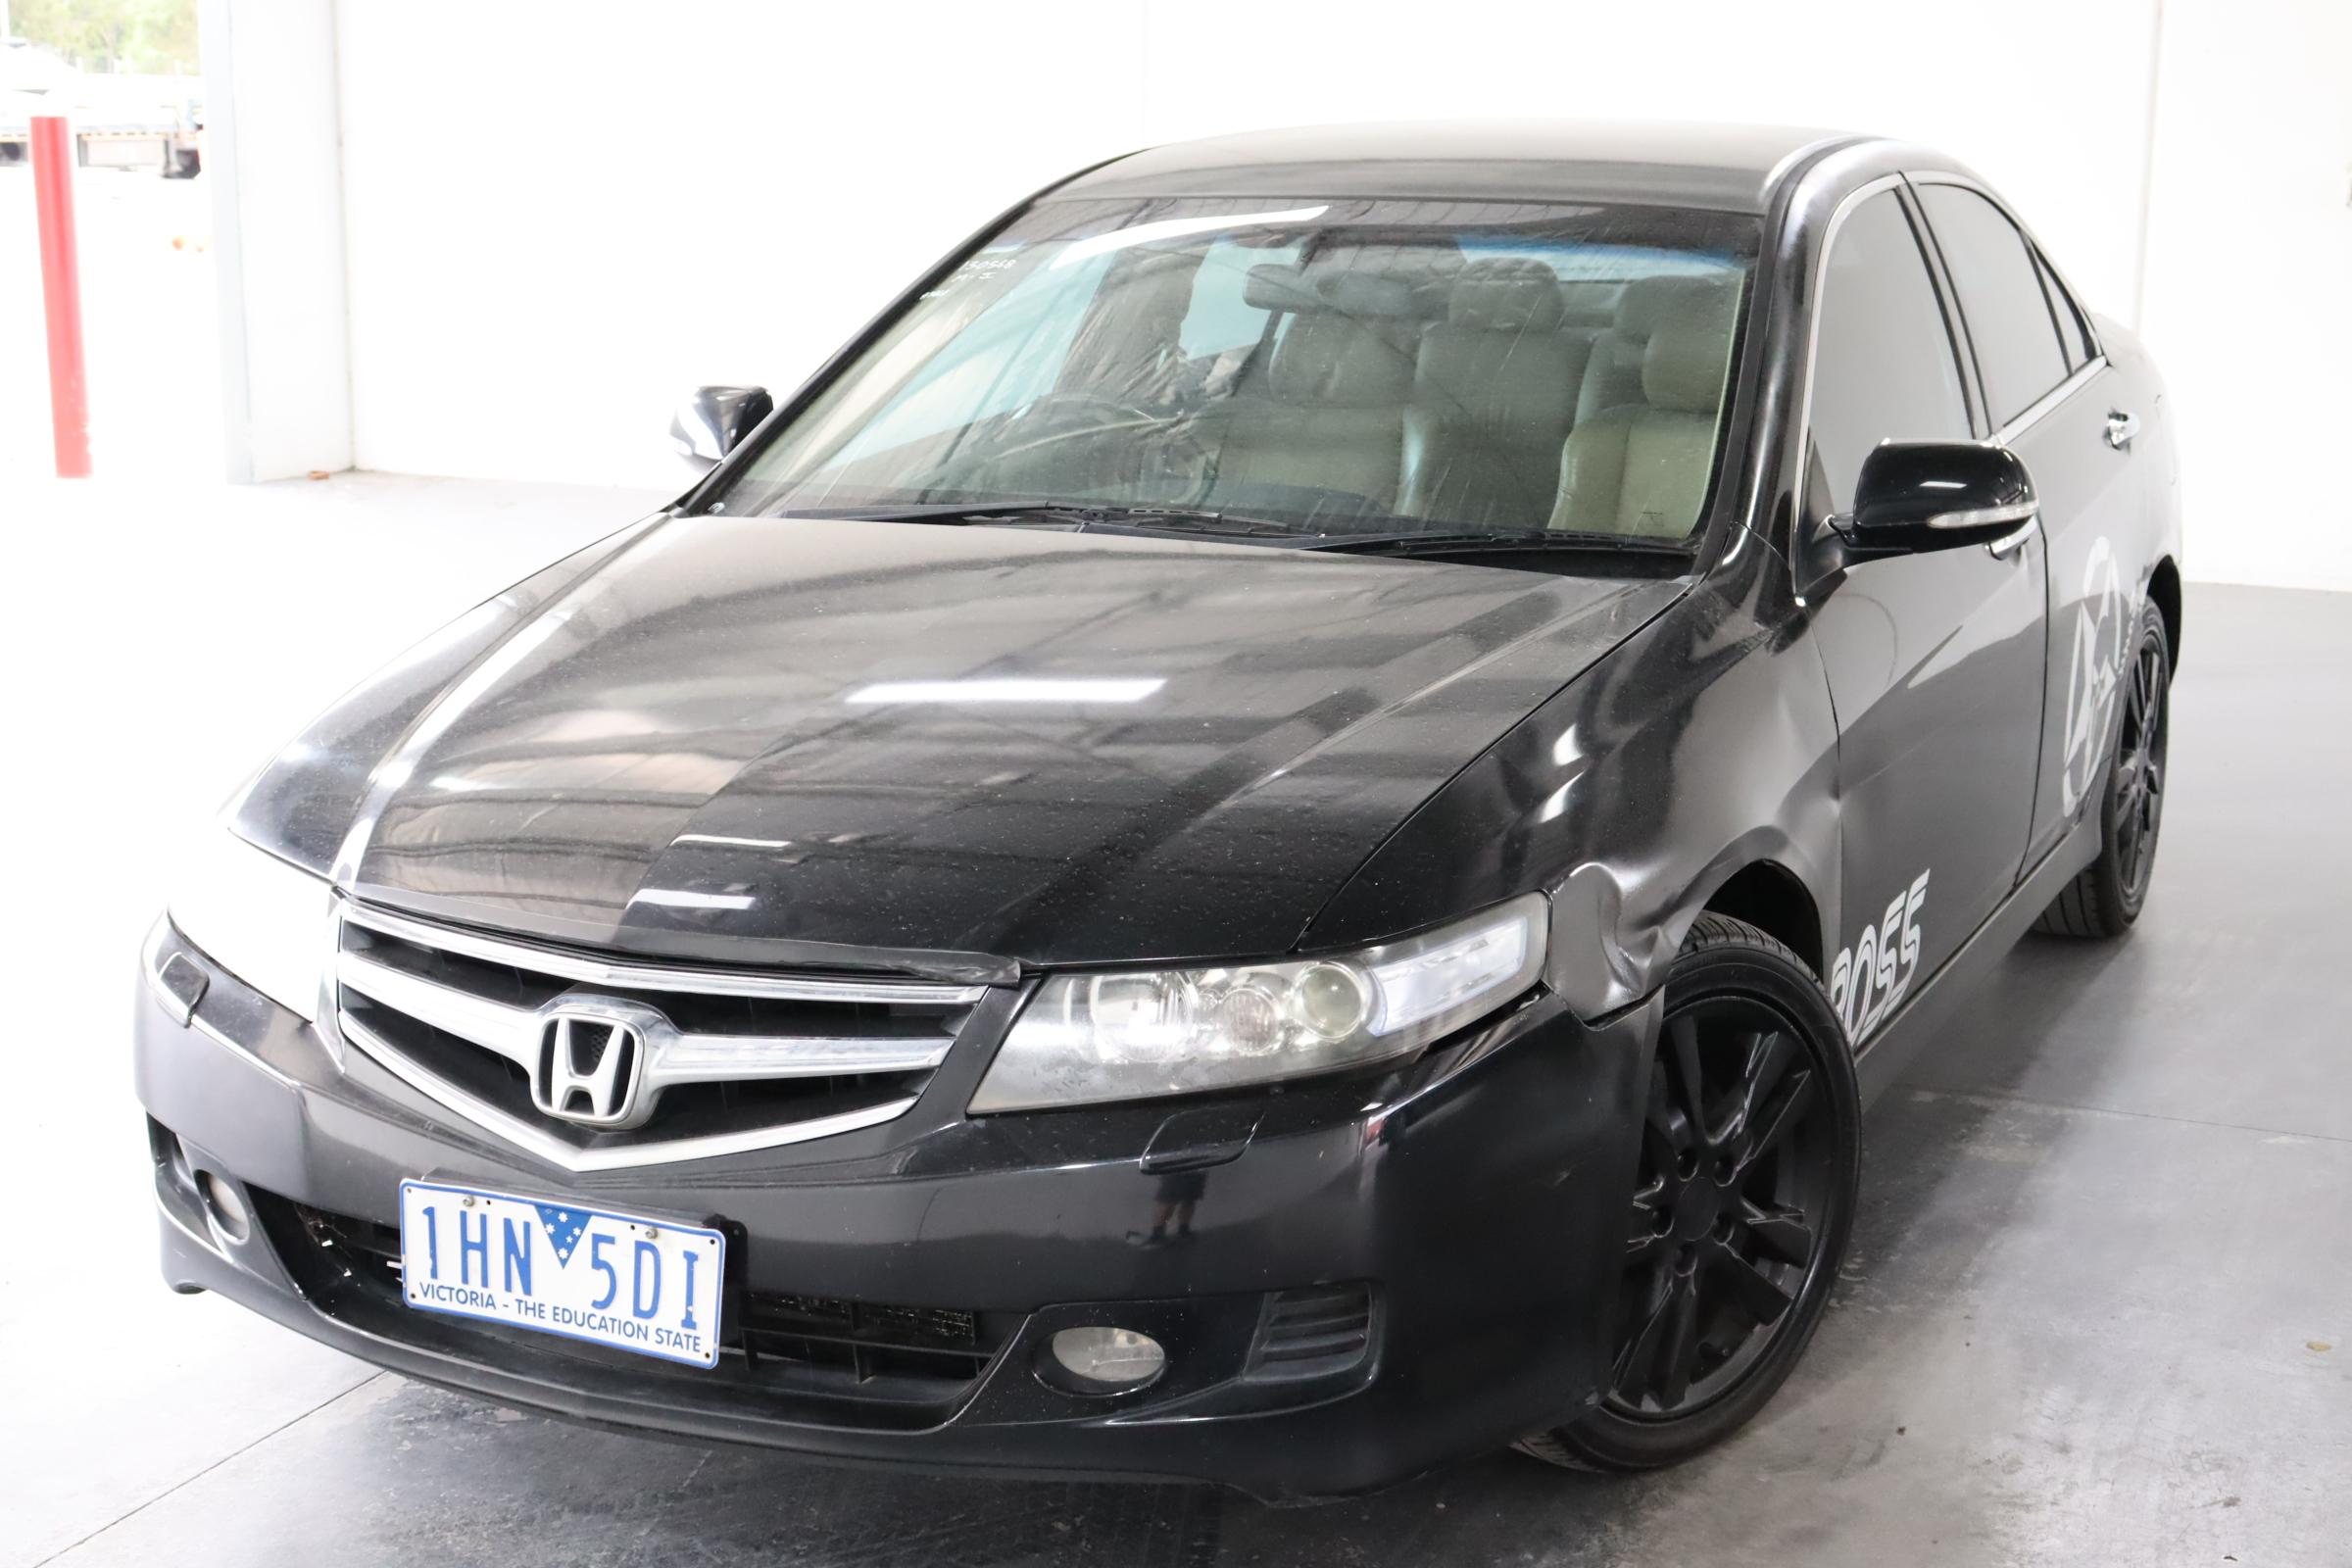 2007 Honda Accord Euro 7th Gen Automatic Sedan (WOVR Inspected)